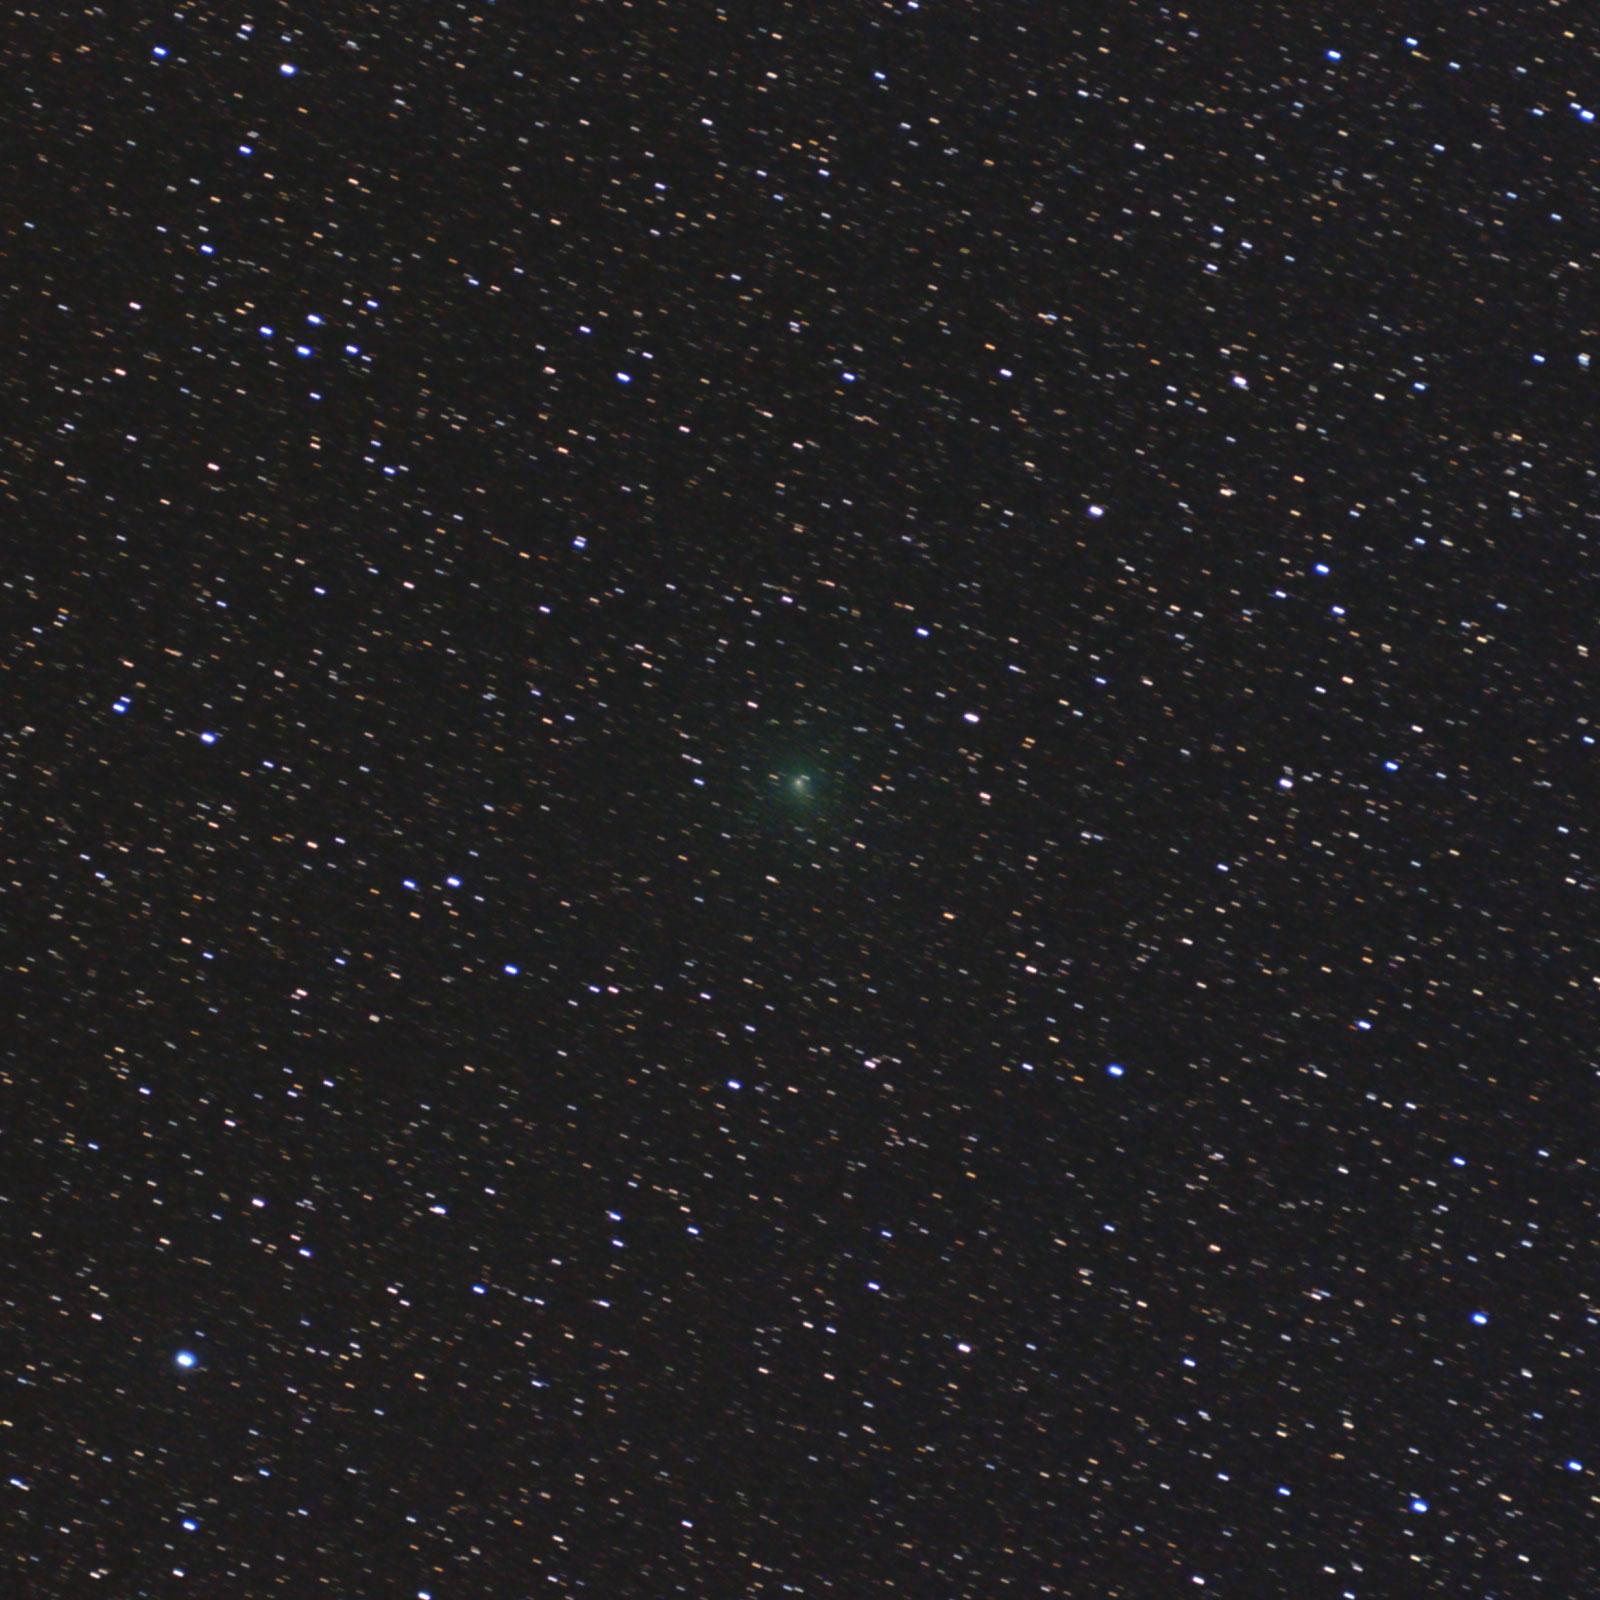 Comet_103p_20100928_20h09m_tr